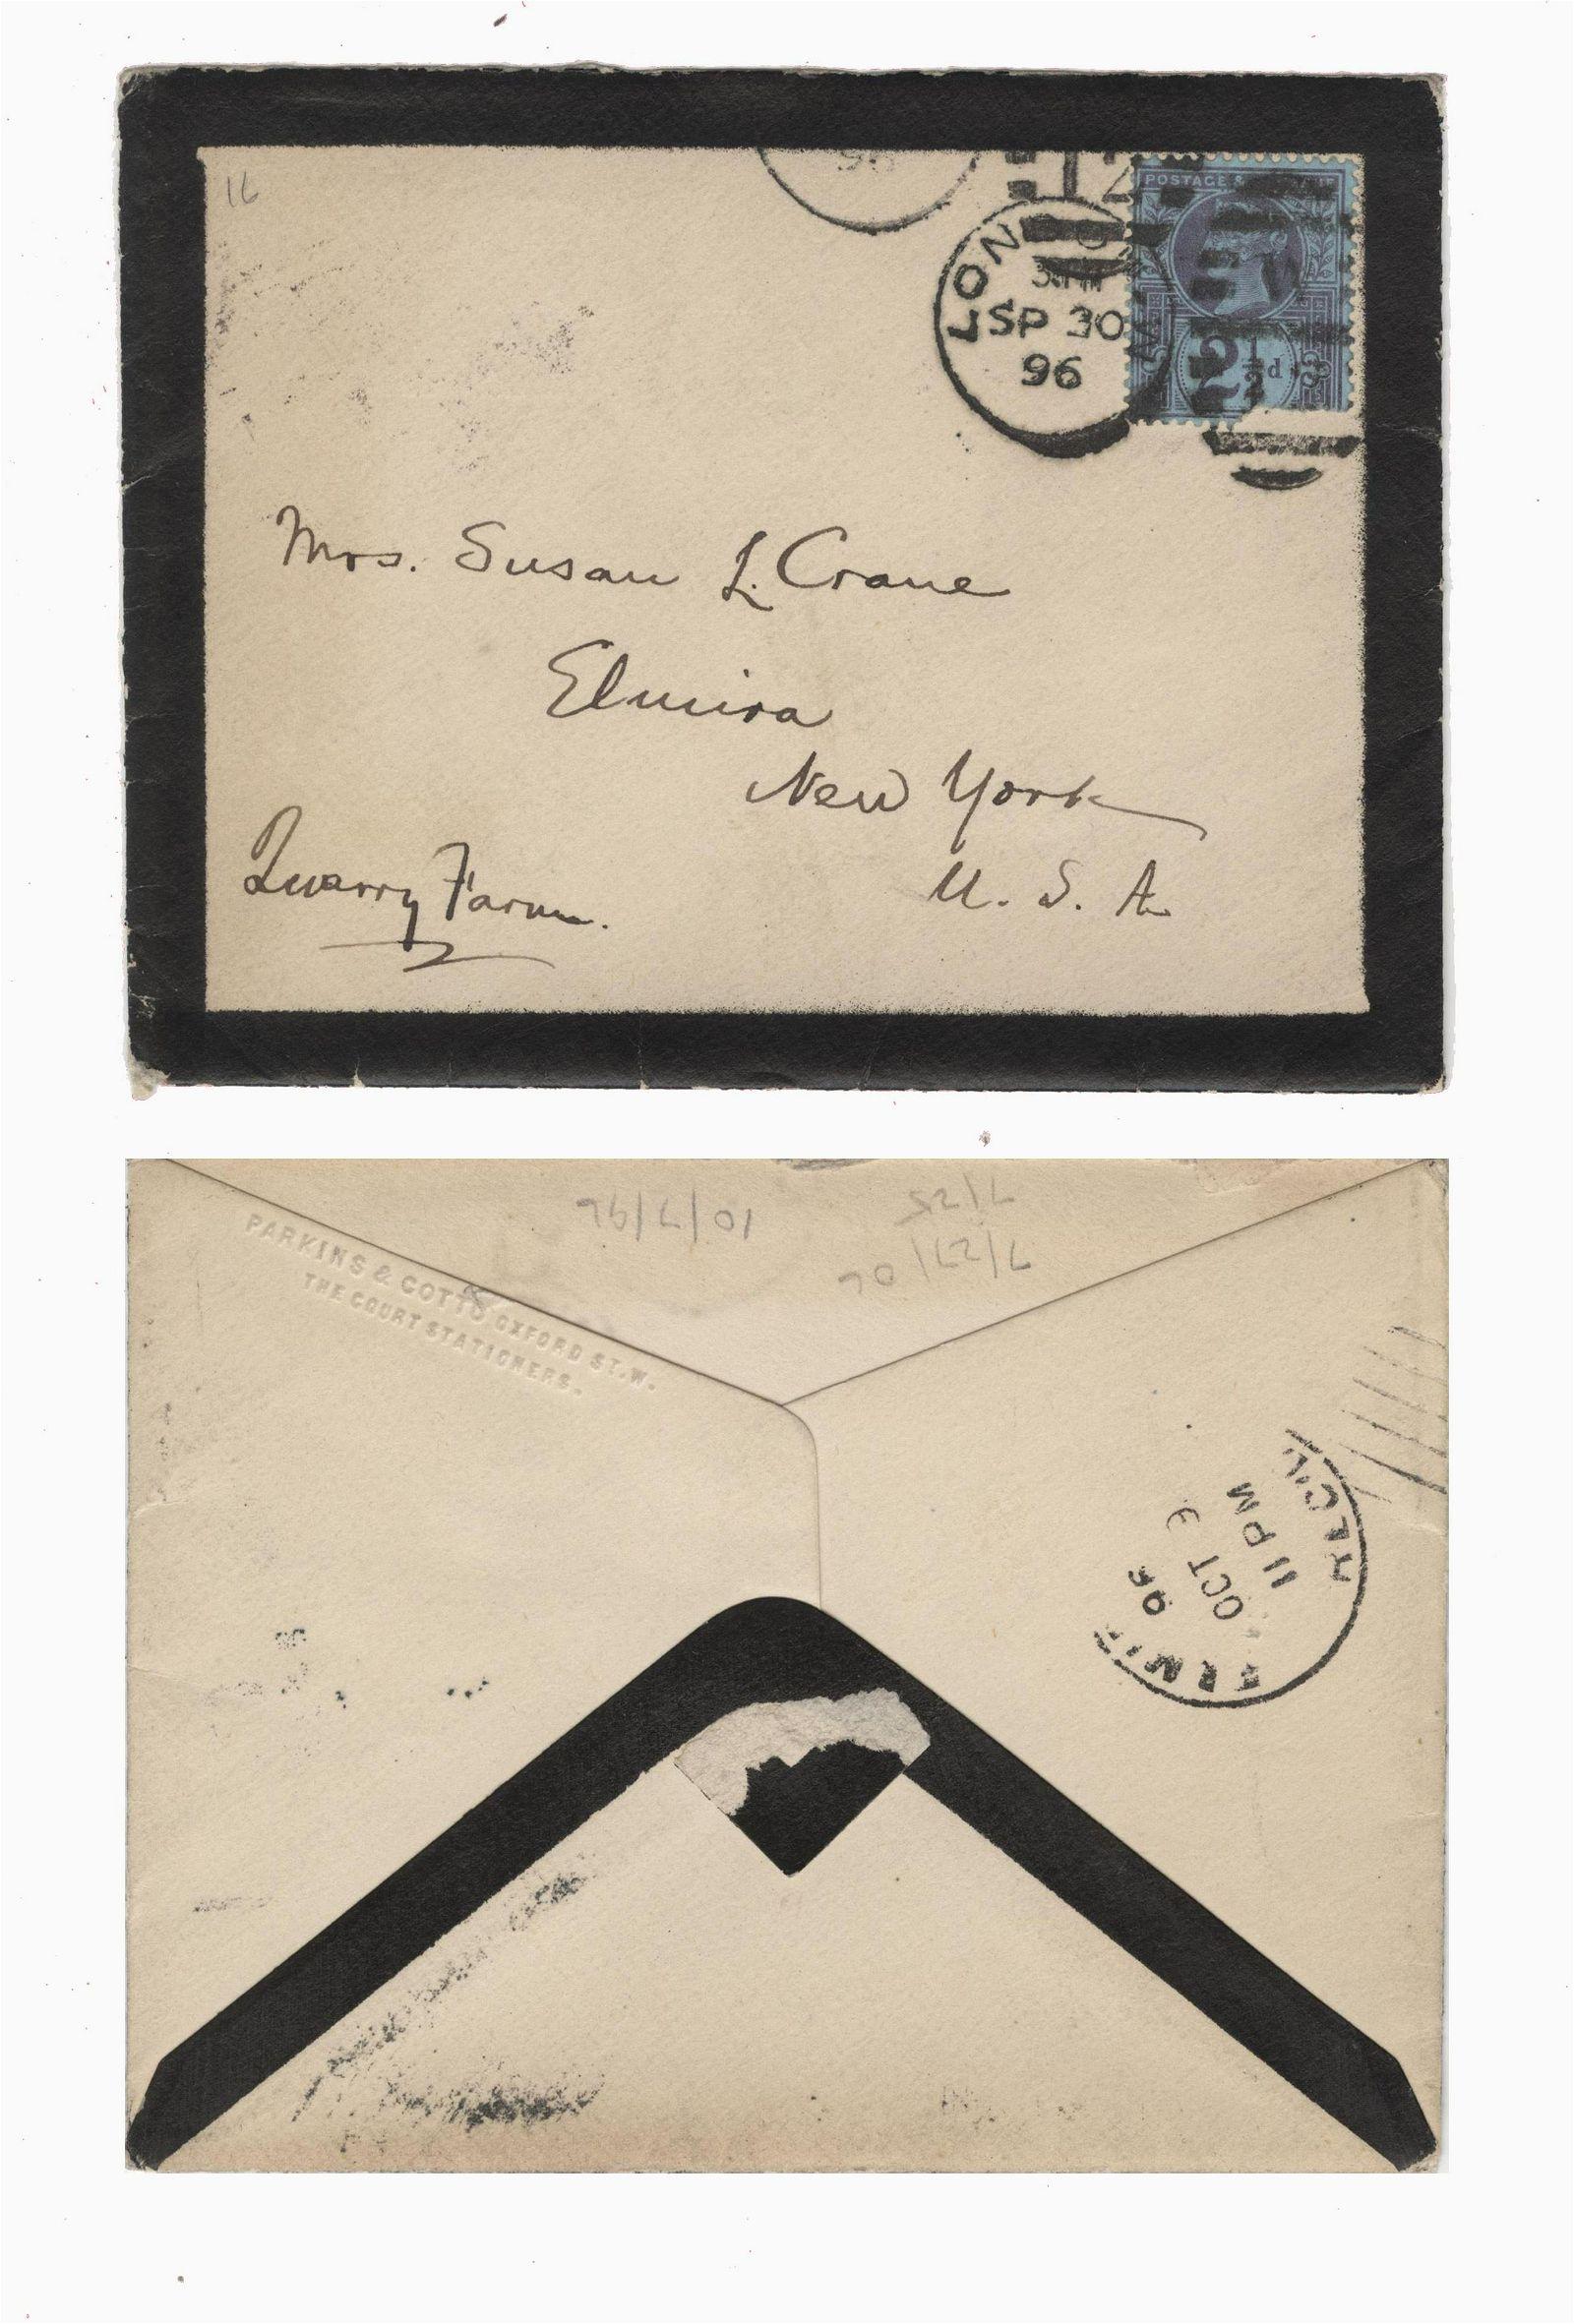 Mark Twain Autographed Envelope